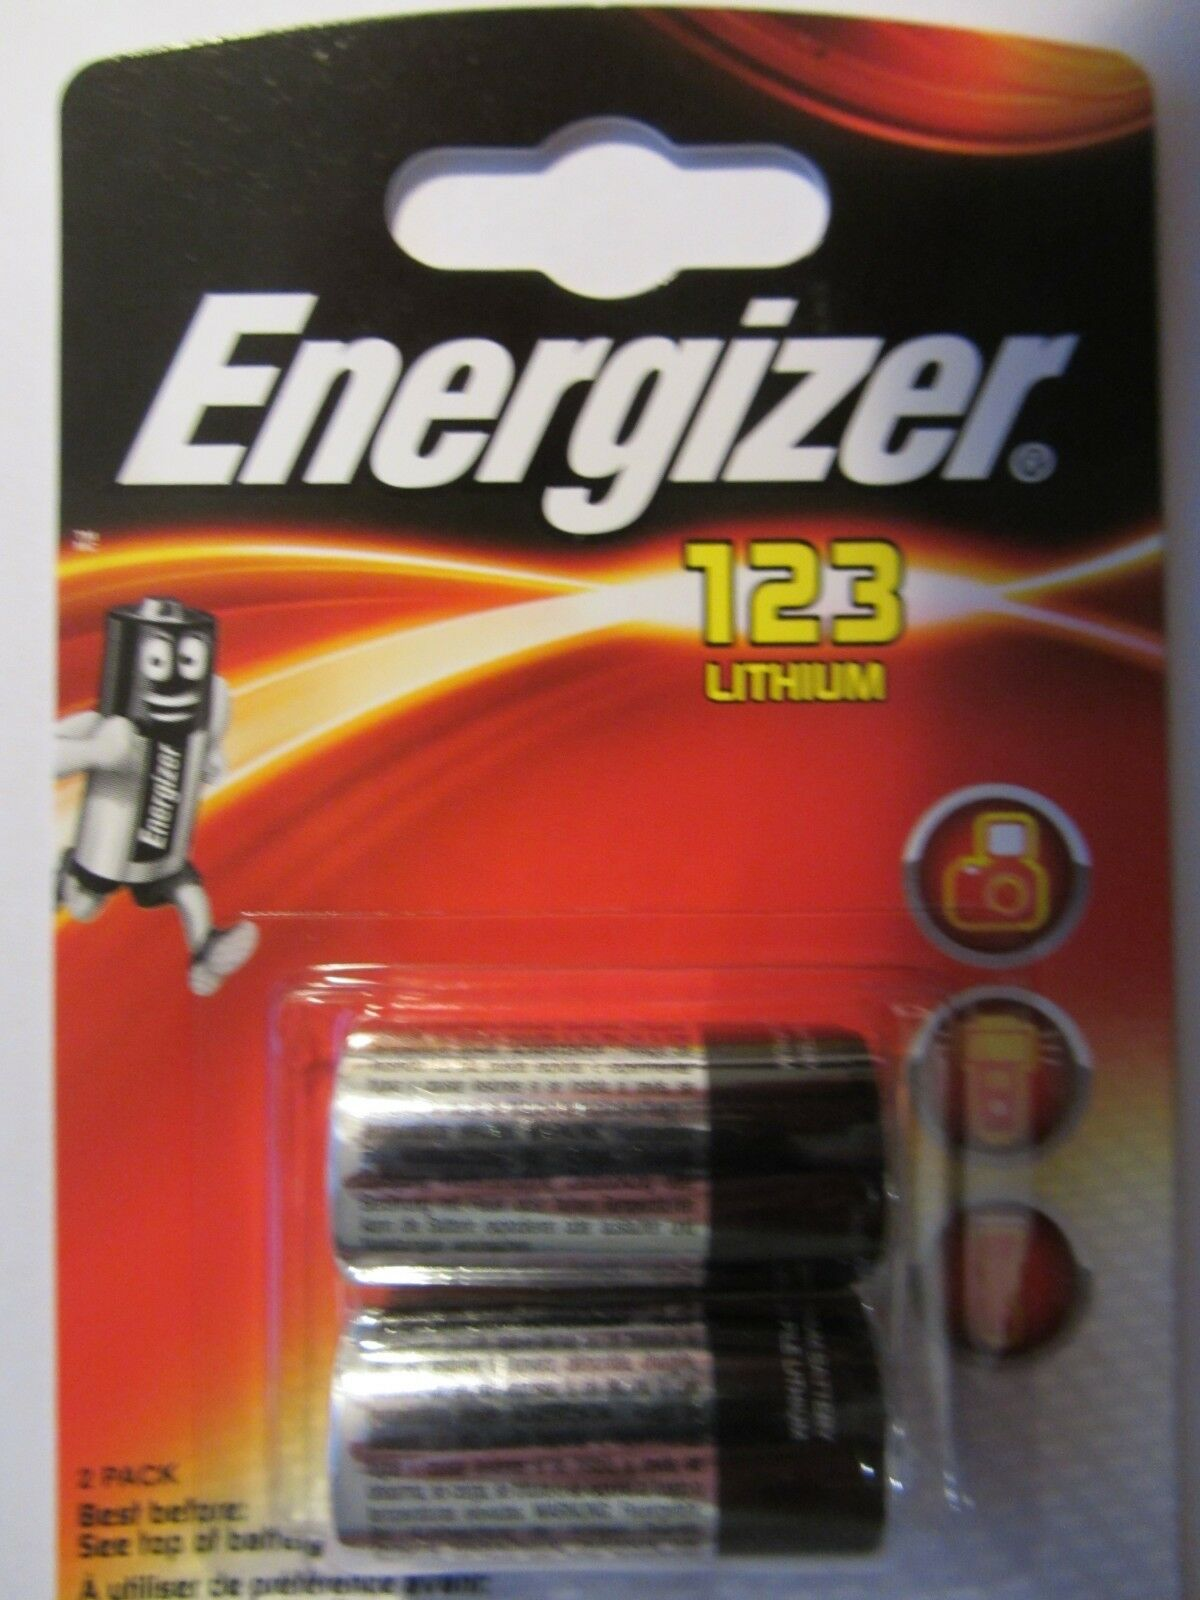 Energizer Lithium Photo CR123A DL123A CR17345 2er Blister MHD 12 2027   Modernes Design